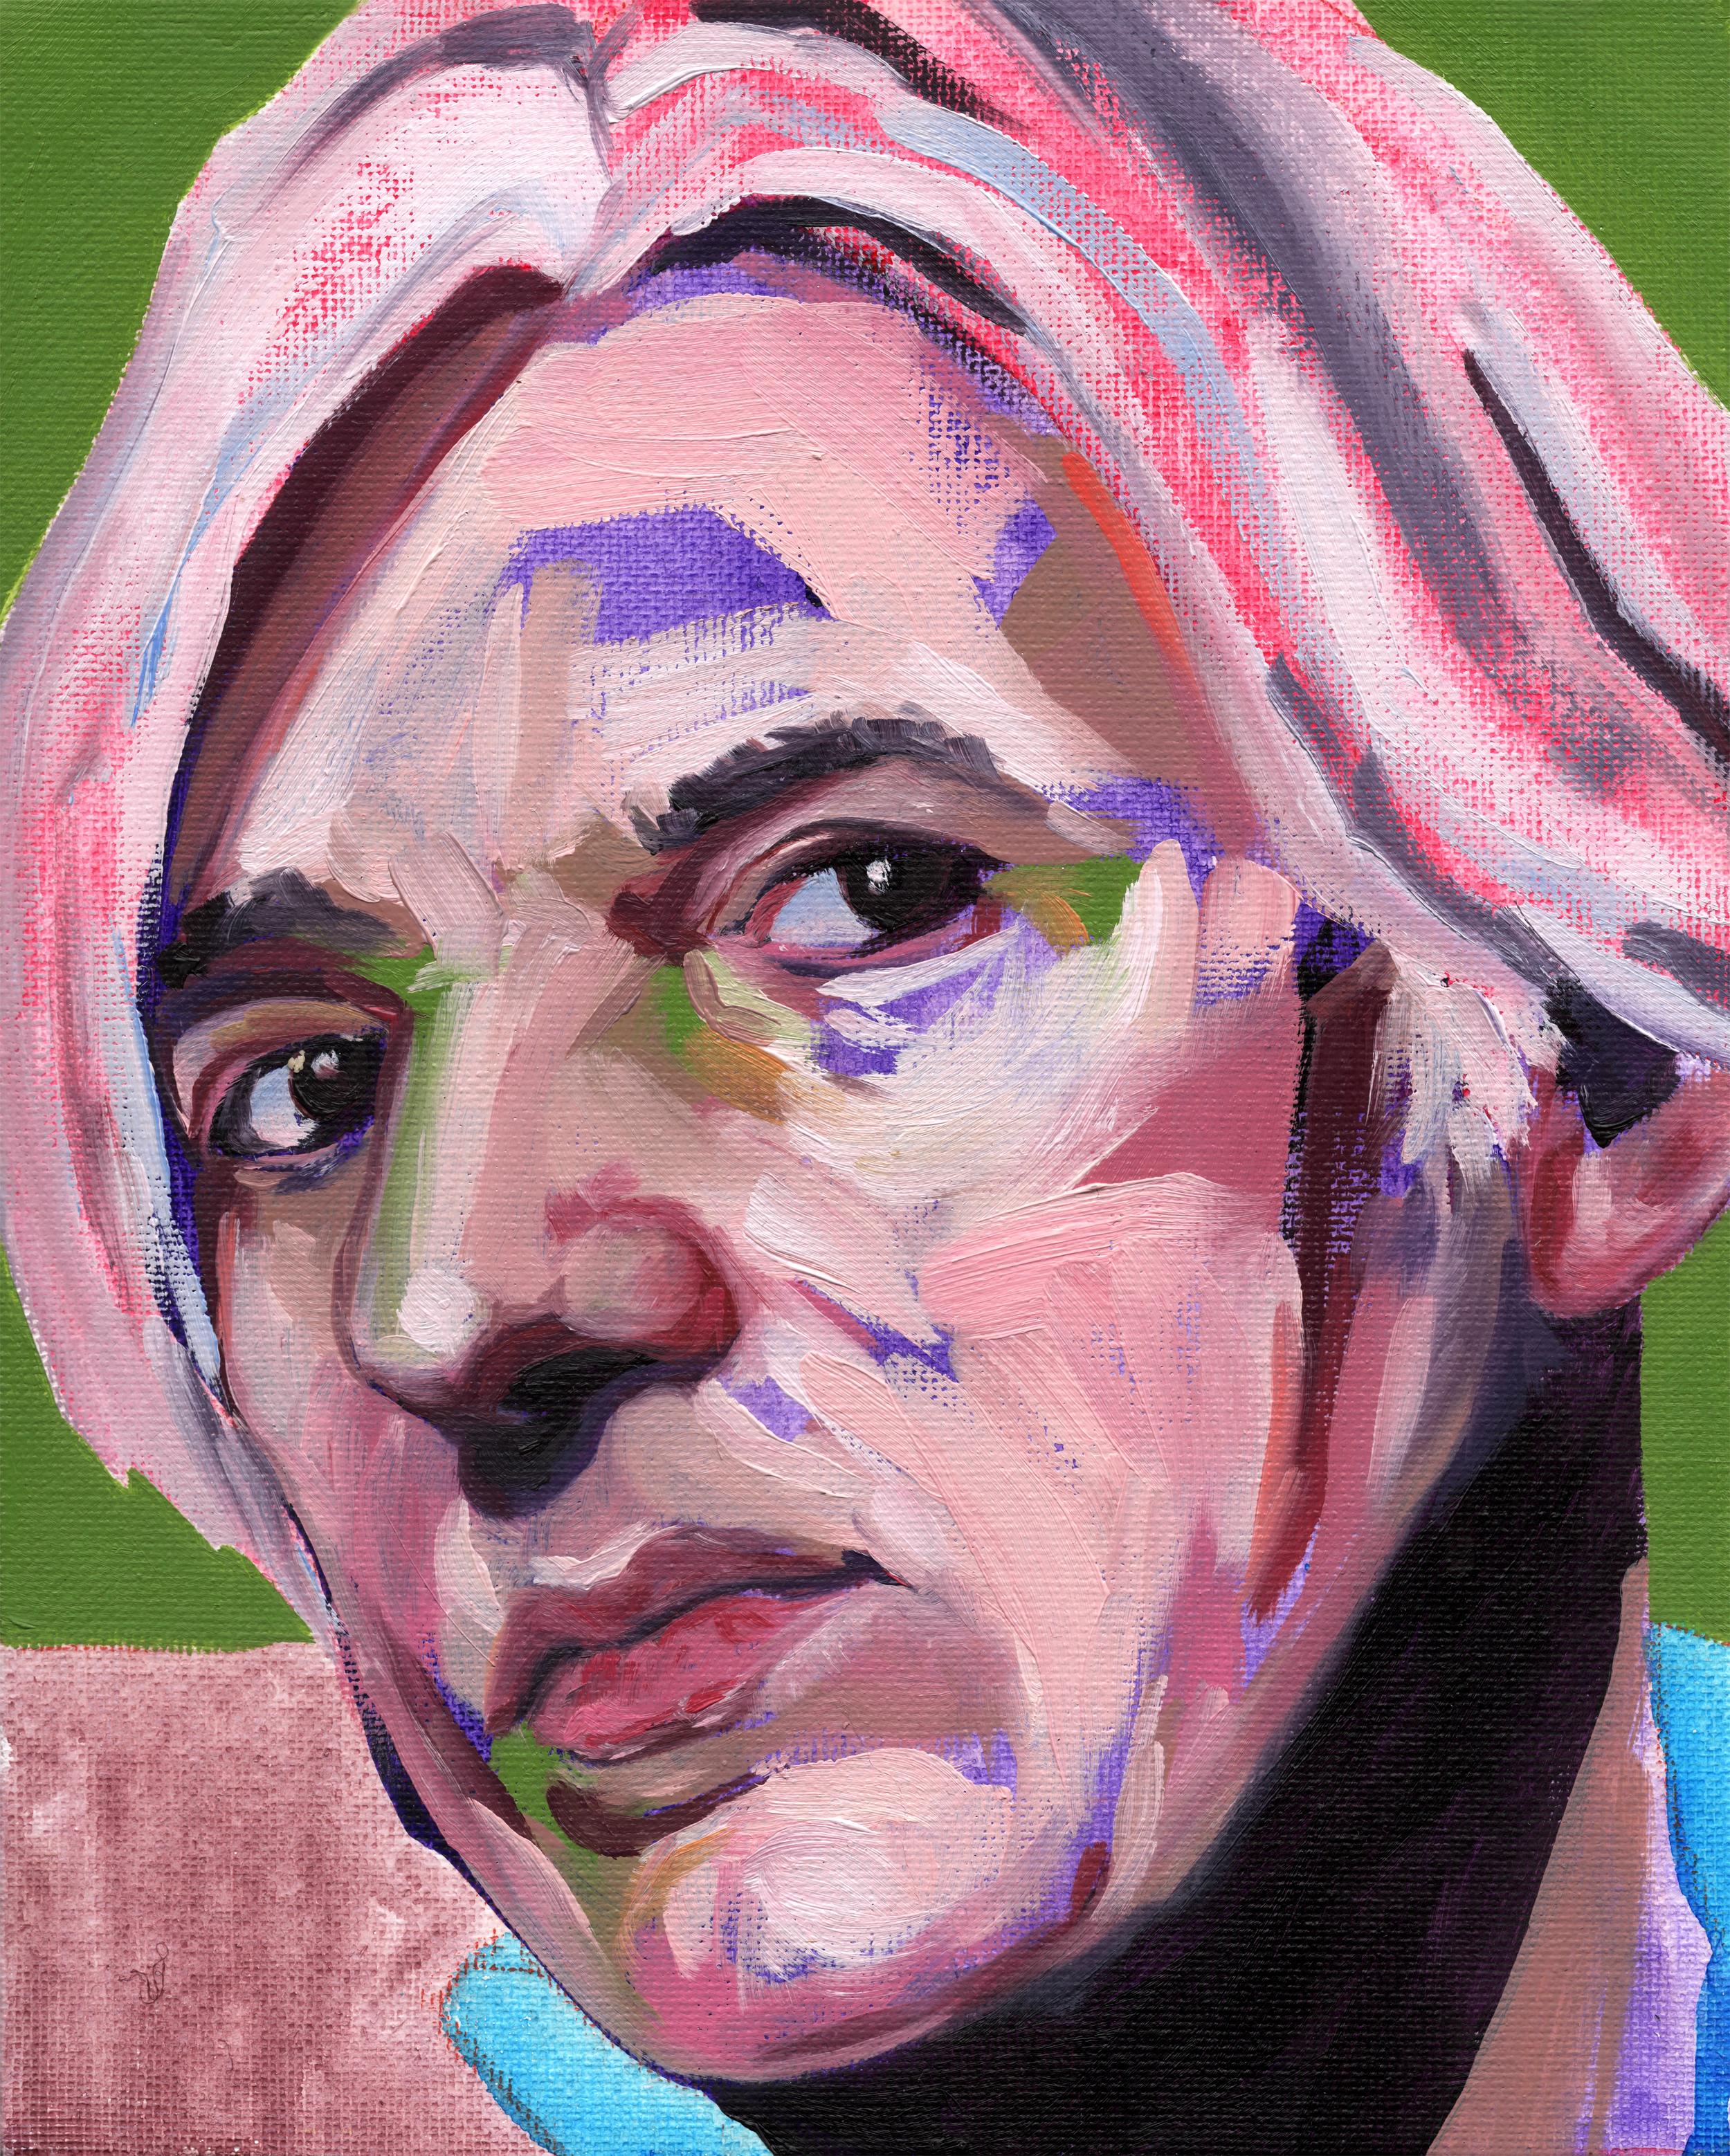 Robyn Hitchcock Green